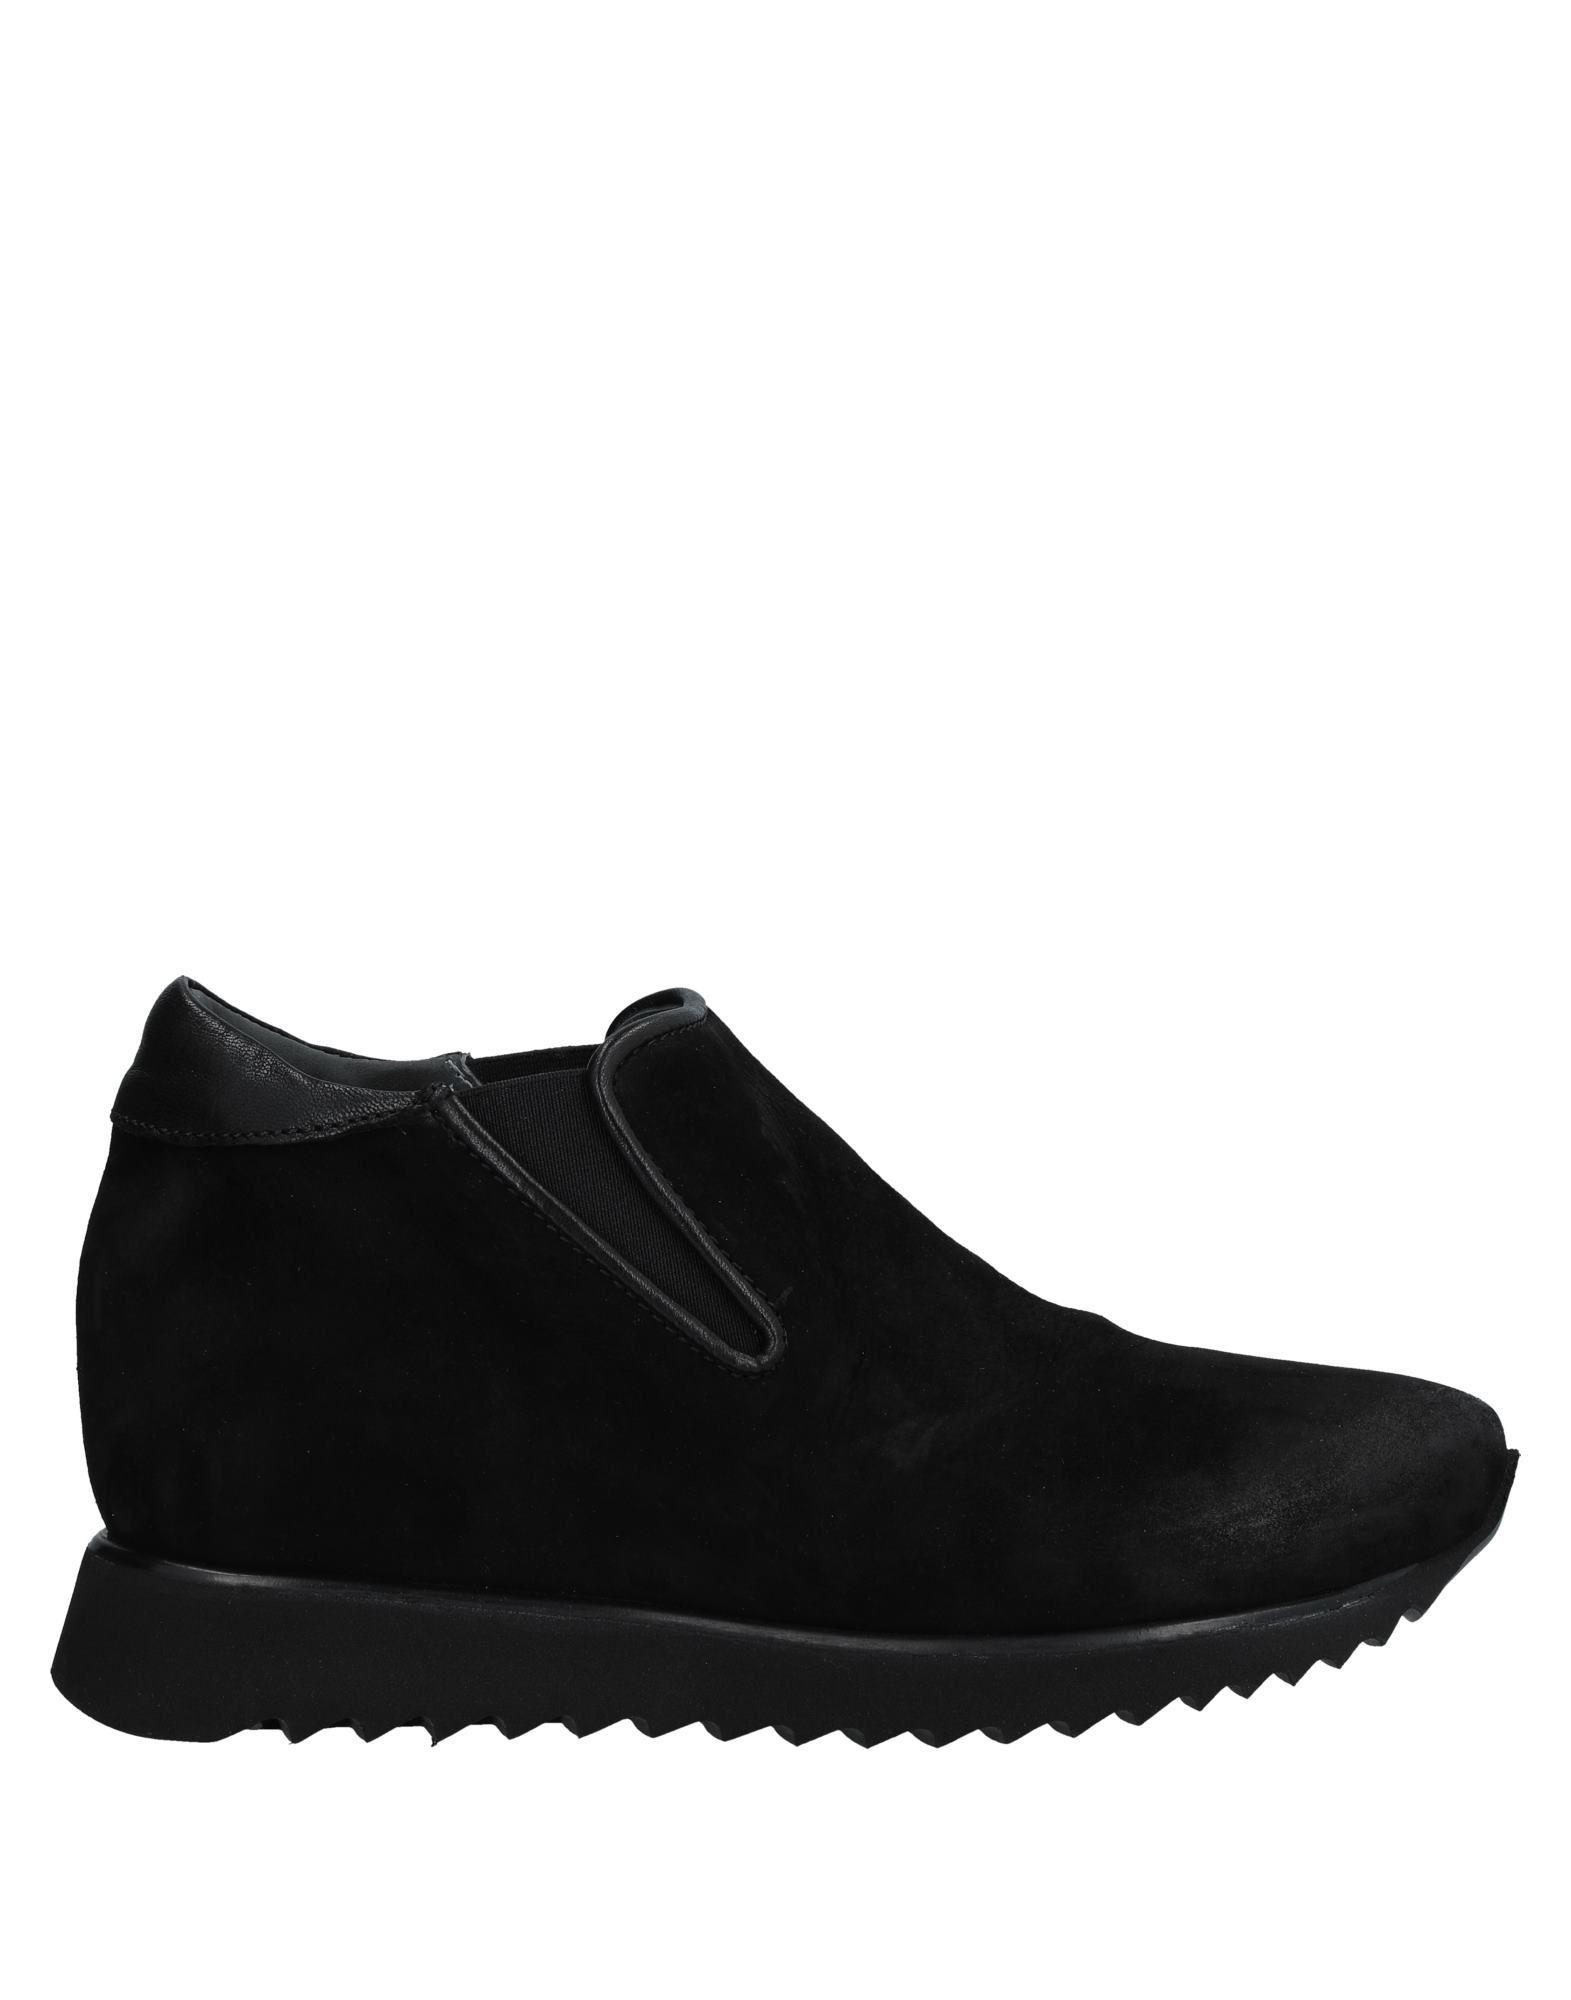 Gut um billige Turnschuhes Schuhe zu tragenAndìa Fora Turnschuhes billige Damen 11530870LJ d2fdf1